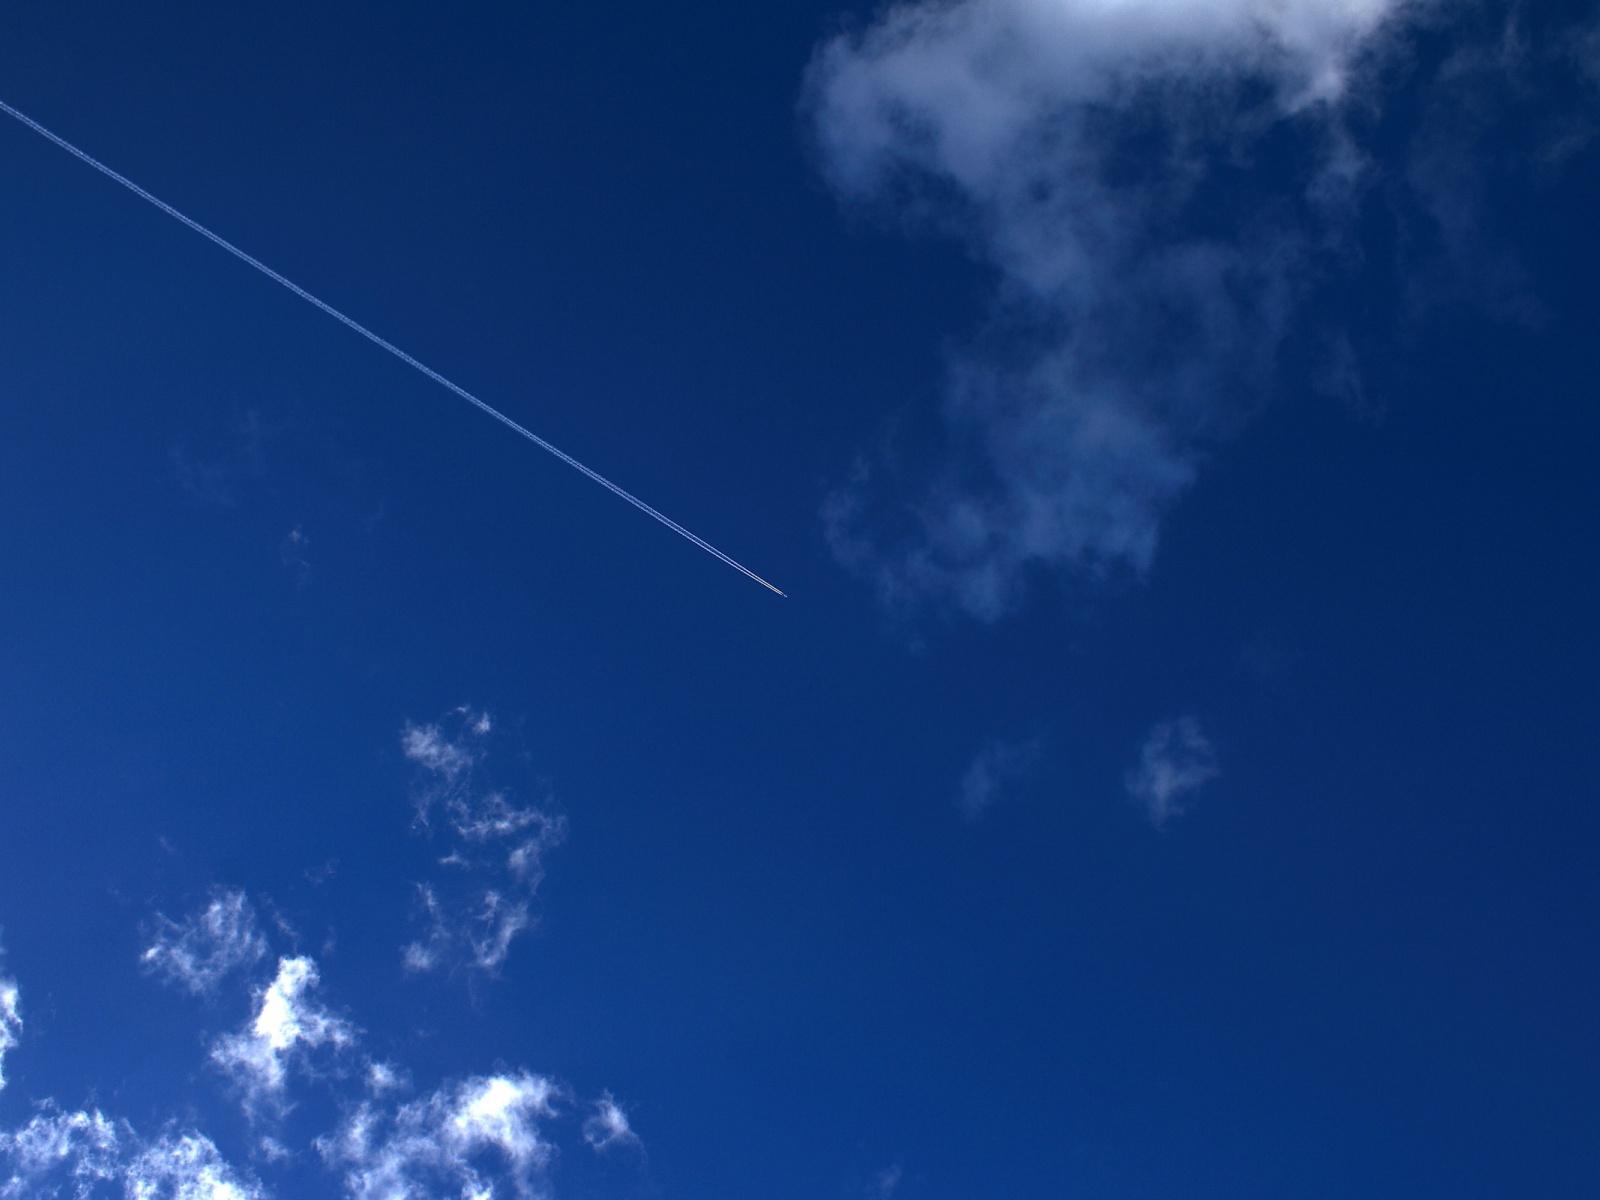 5366-avion-dans-le-ciel-viaa